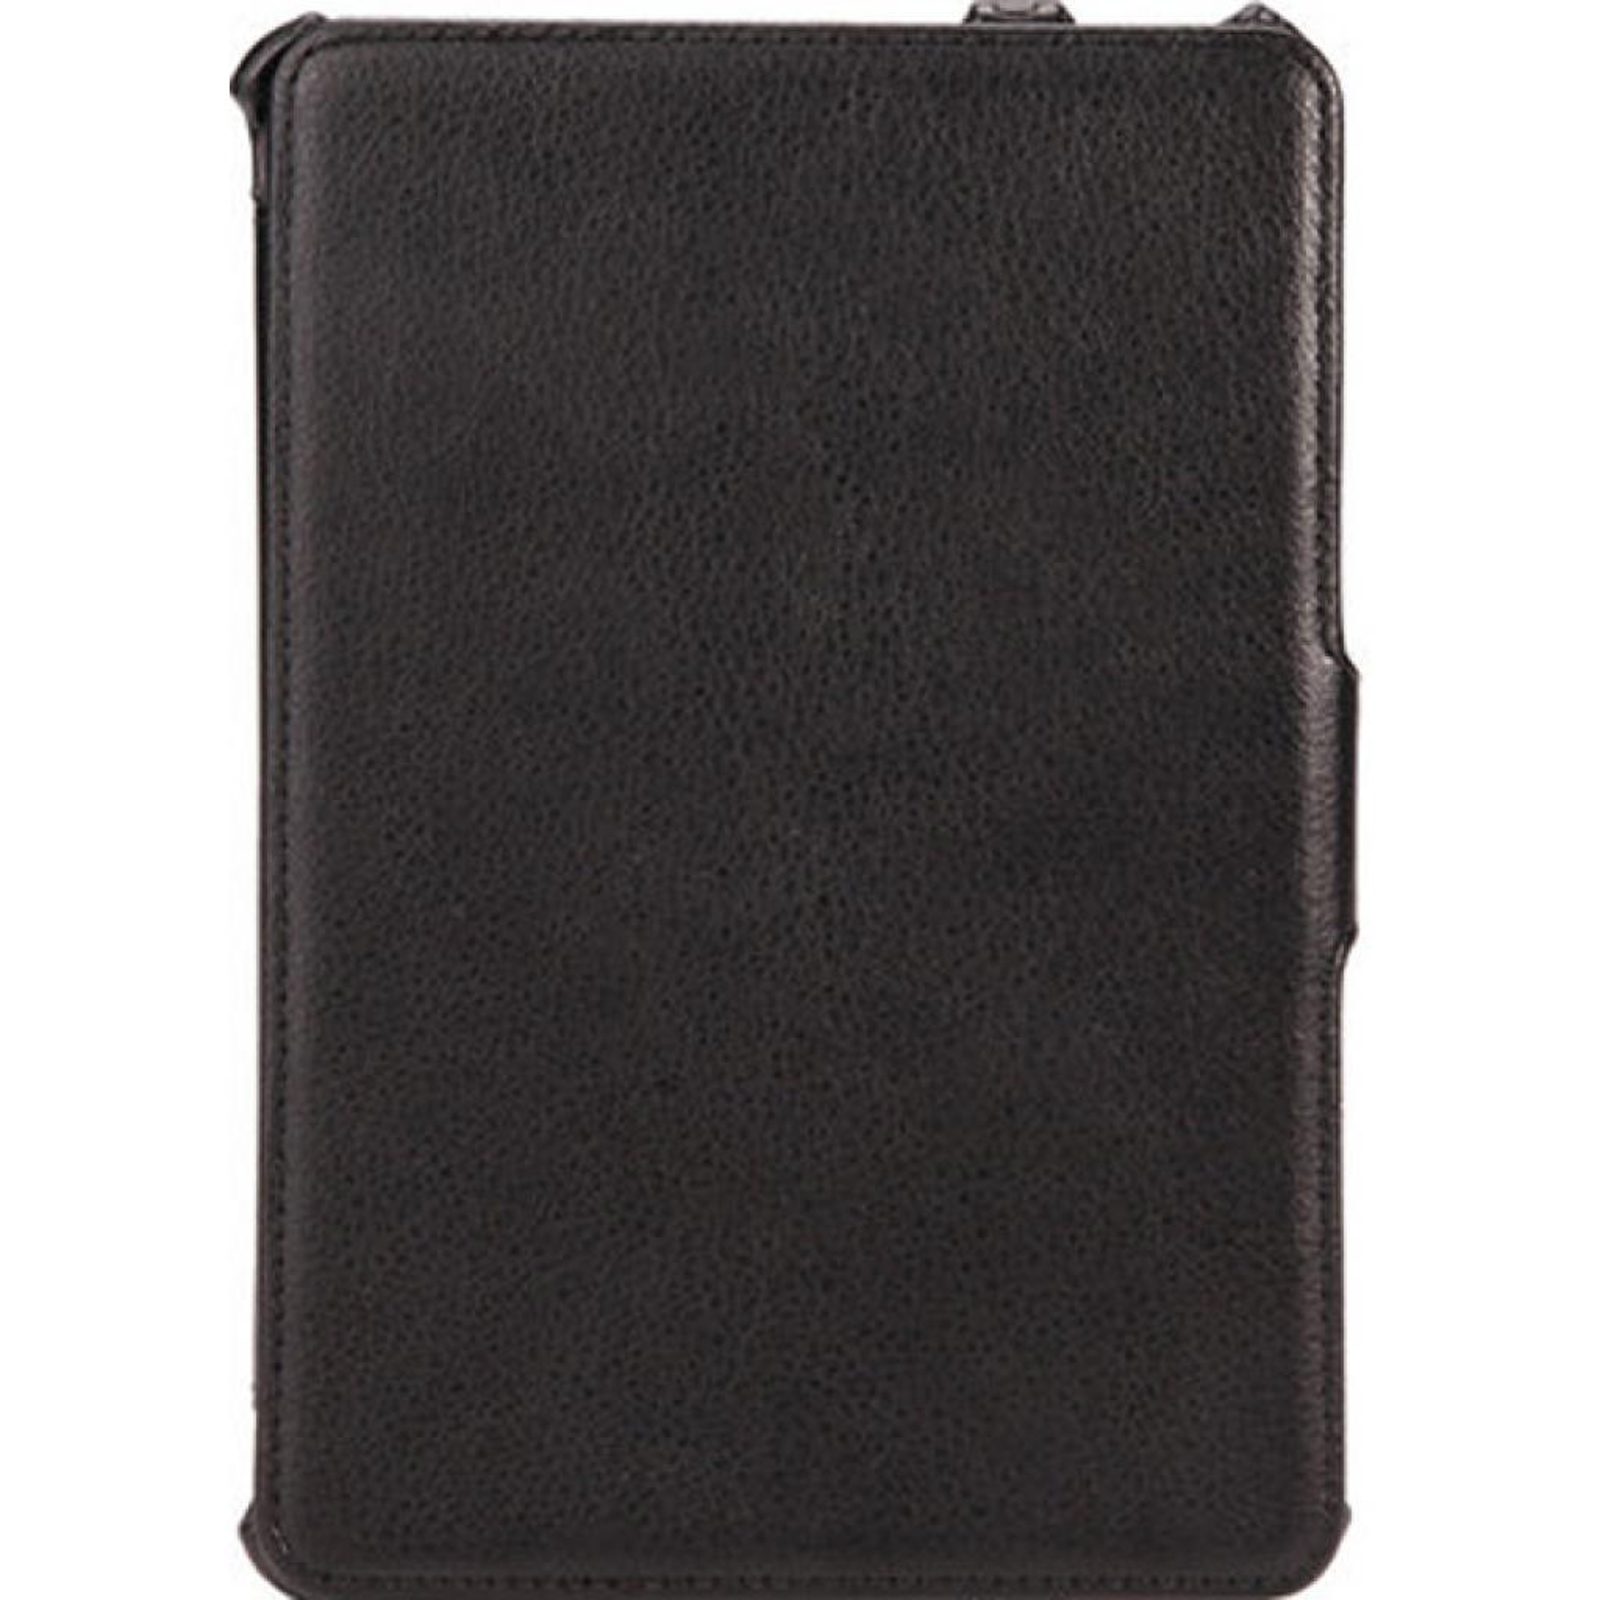 Чехол для планшета AirOn для Samsung Galaxy Tab S 2 8.0 black (4822352777418)